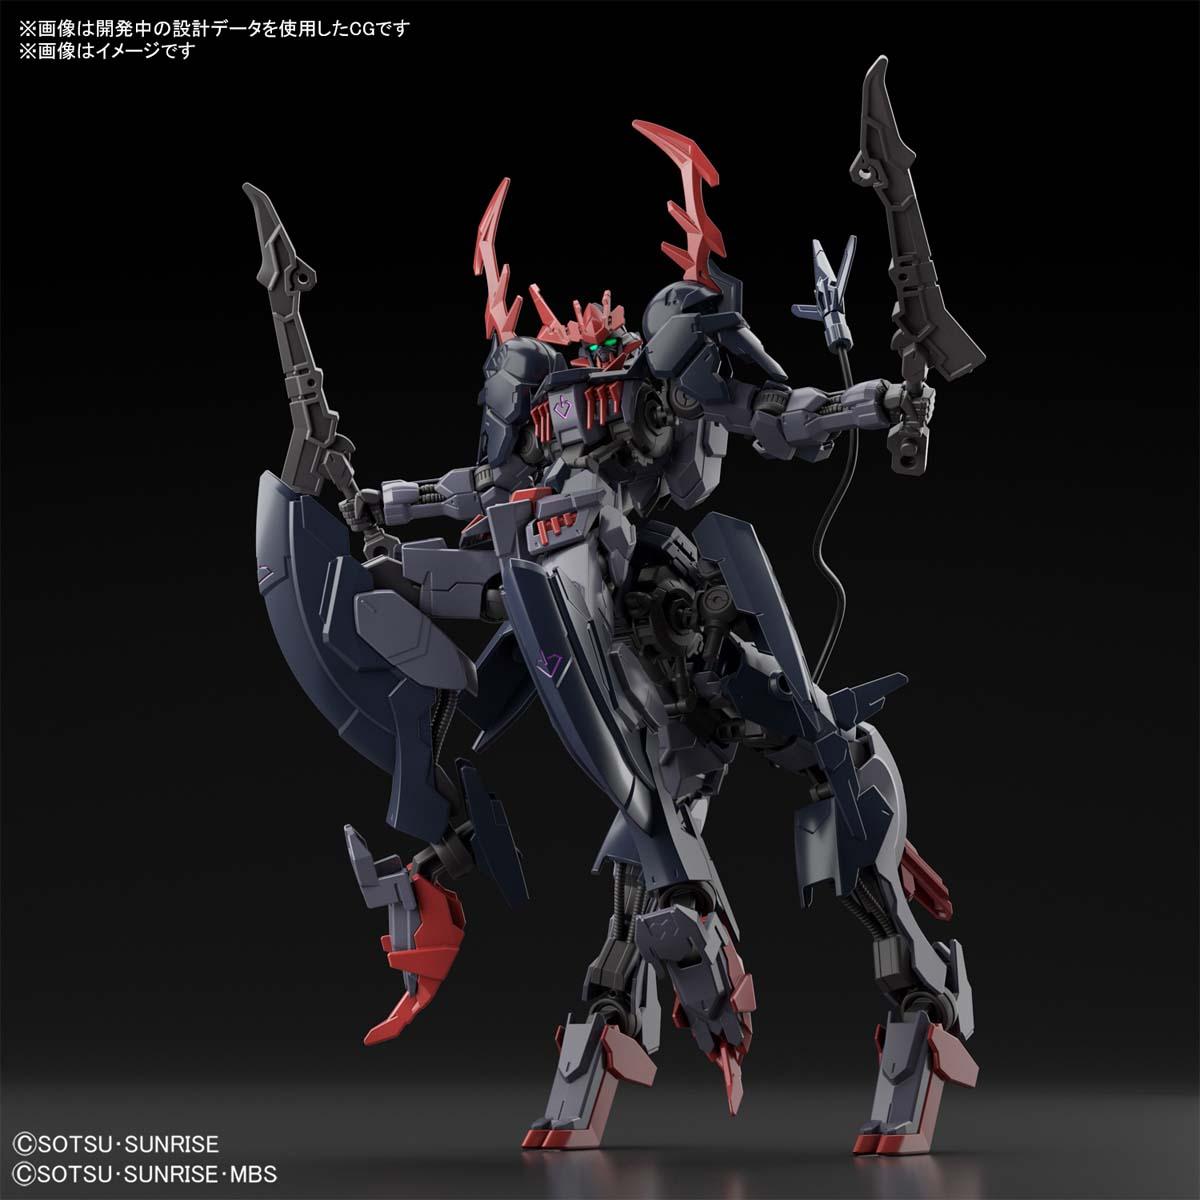 HG 1/144『ガンダムバルバタウロス』ガンダムブレイカー バトローグ プラモデル-005